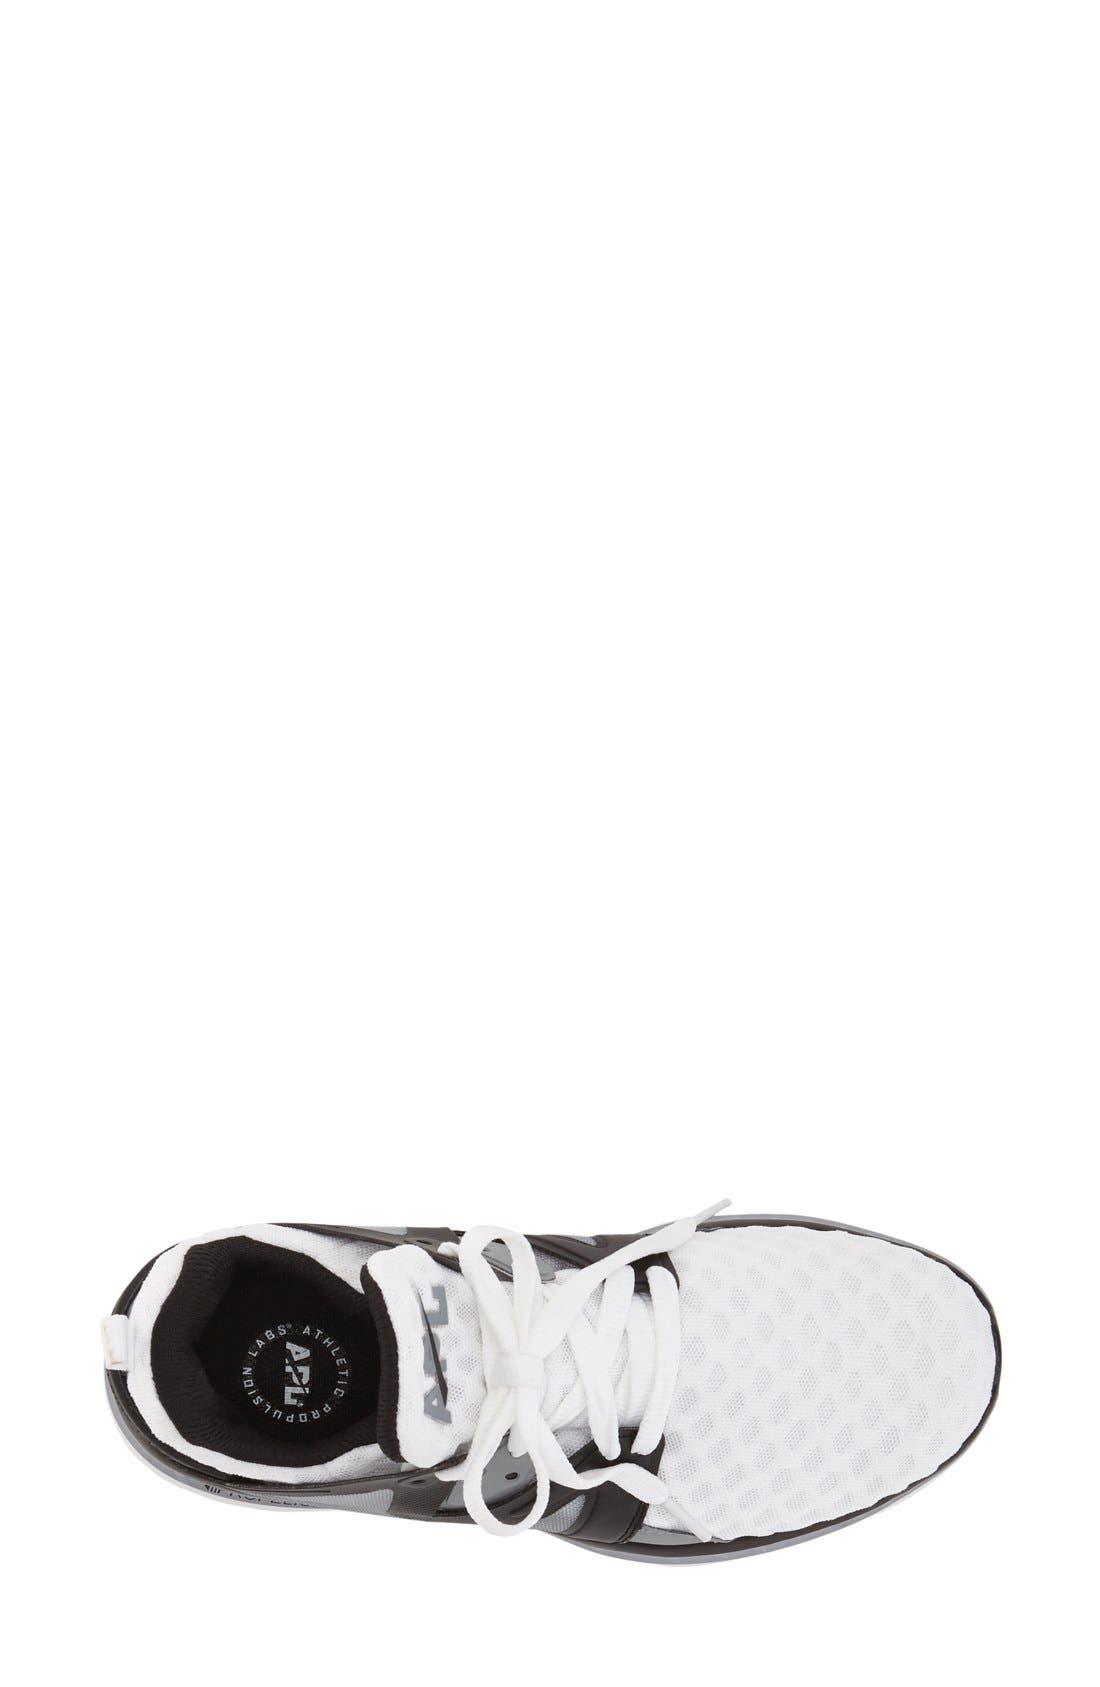 Alternate Image 3  - APL 'Ascend' Training Shoe (Women)